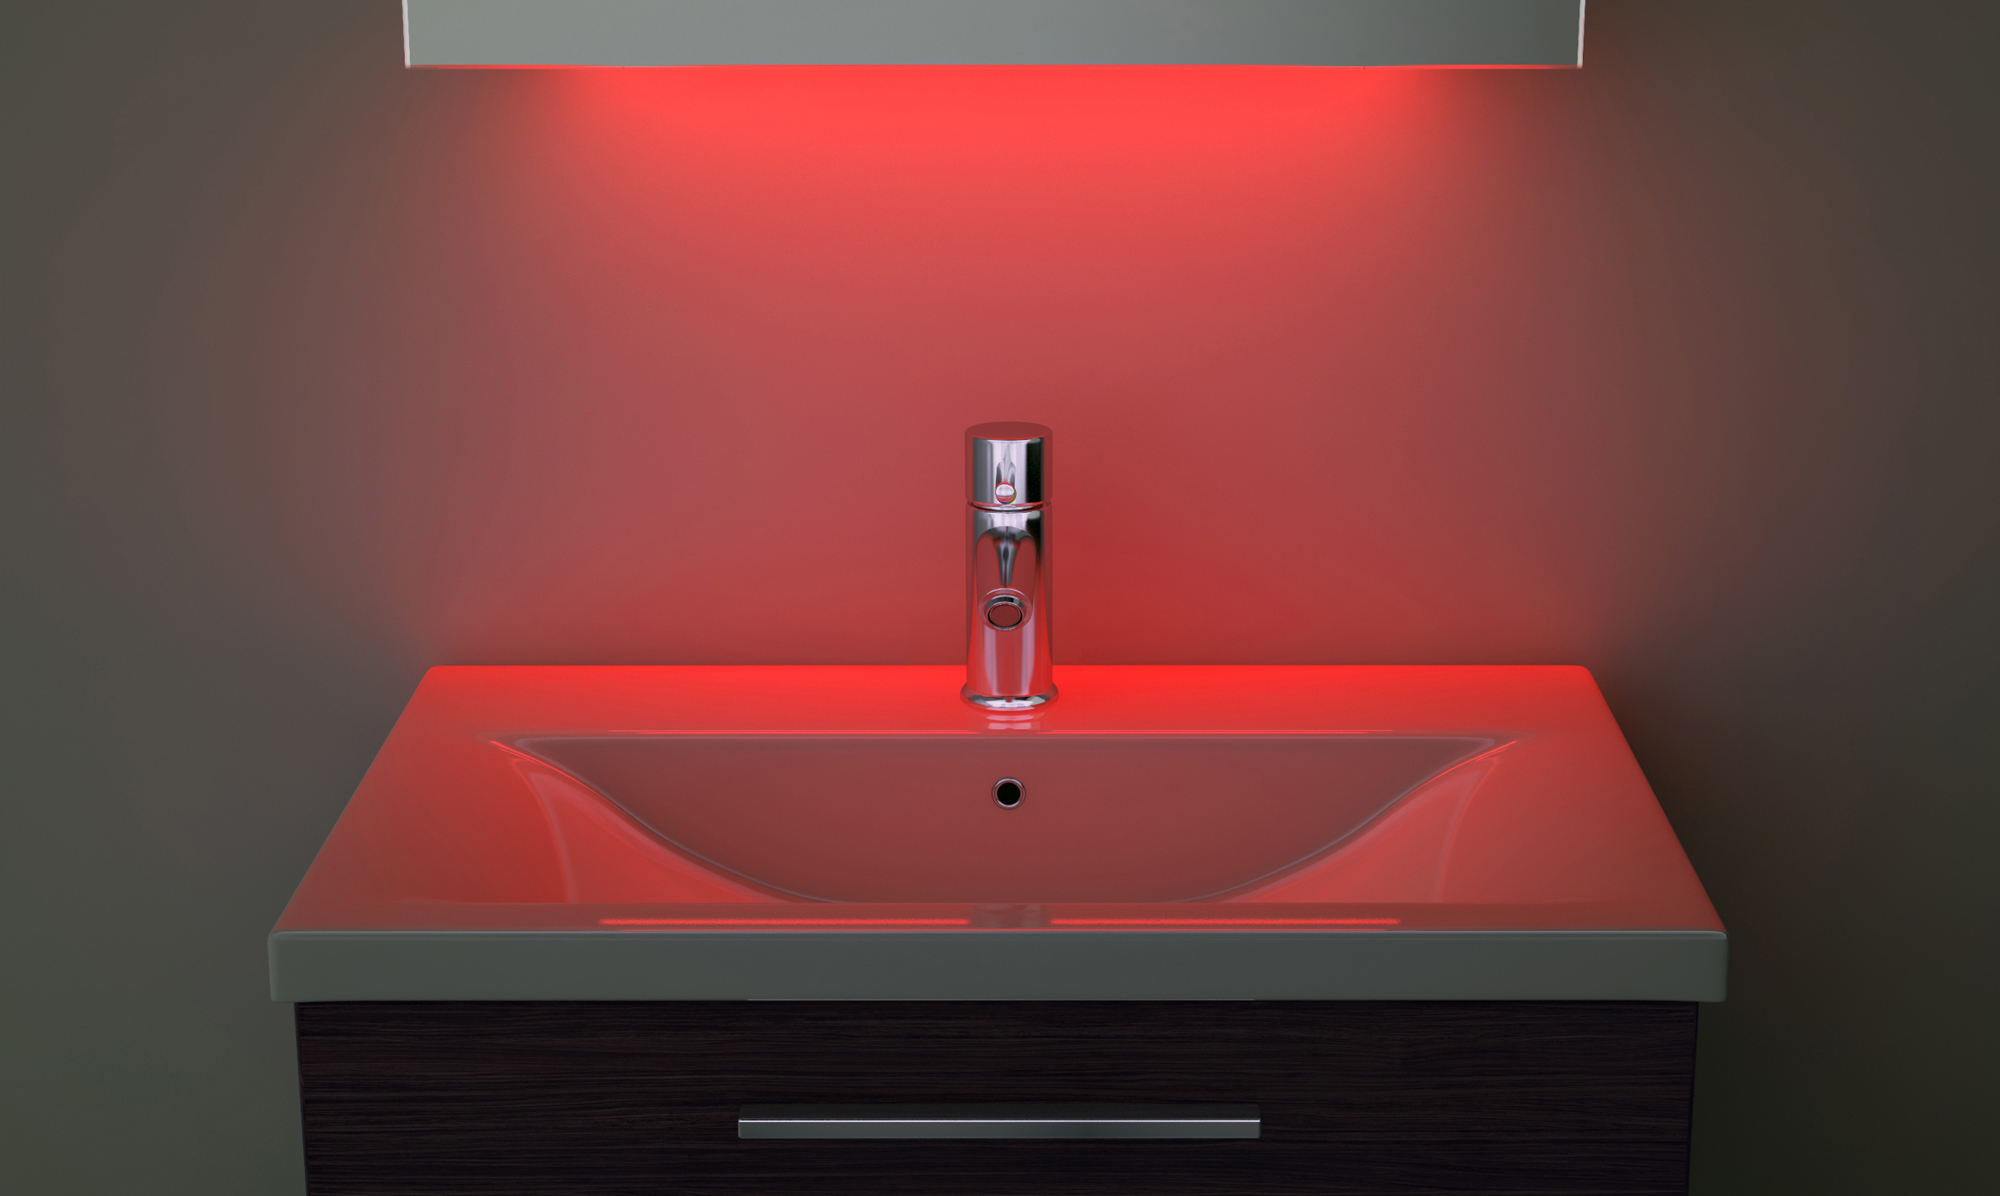 miroir toilette rasage bluetooth anti bu e capteur rasoir lumineux k161iraud ebay. Black Bedroom Furniture Sets. Home Design Ideas